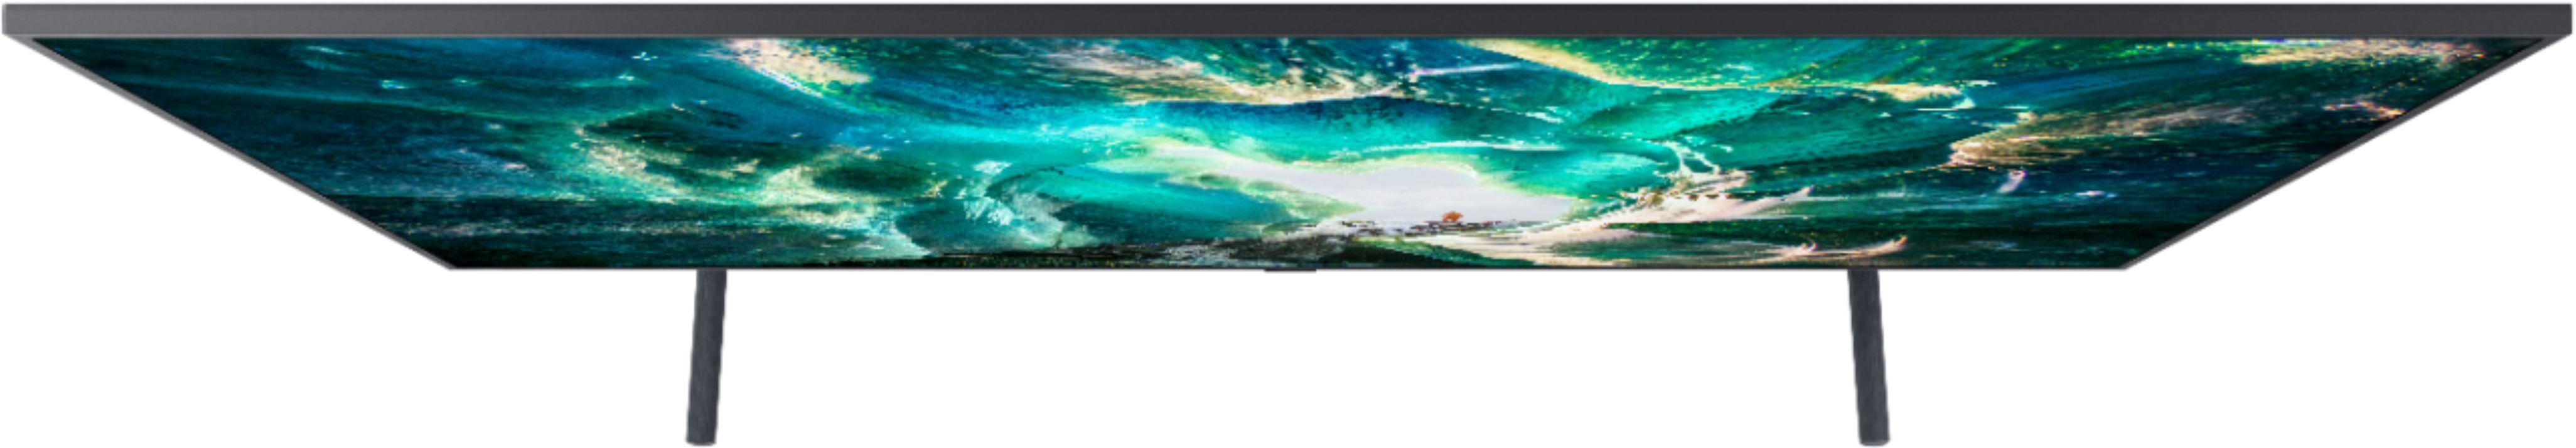 Image 11 for Samsung UN75RU8000FXZA